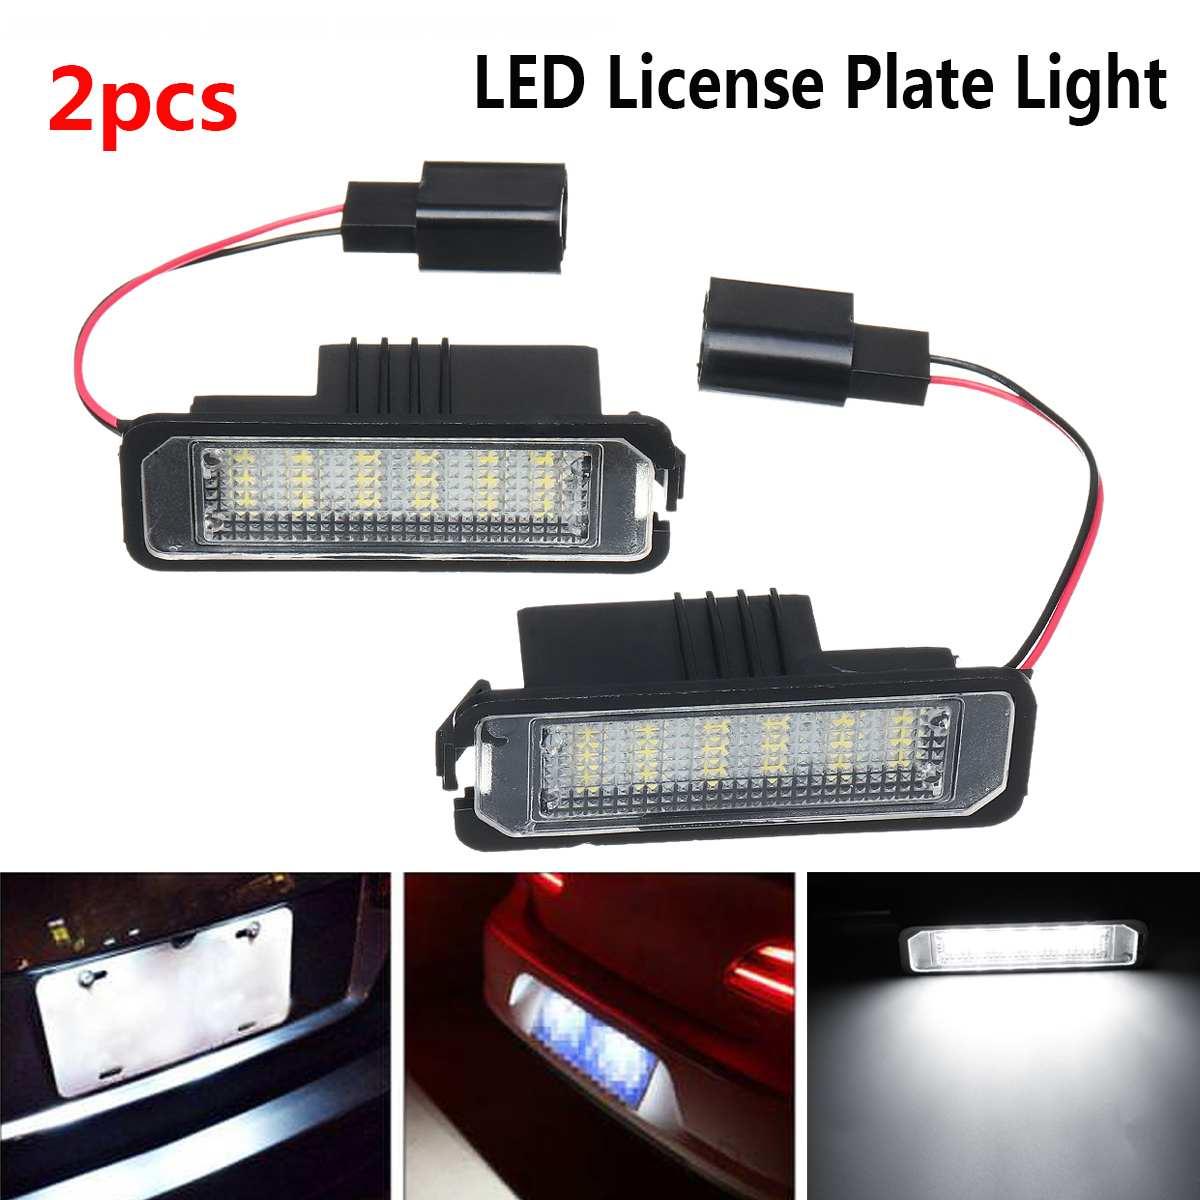 2Pcs 12V 5W LED 번호 번호판 라이트 램프 폭스 바겐 골프 4 6 폴로 9N Passat 자동차 번호판 조명 외부 액세스